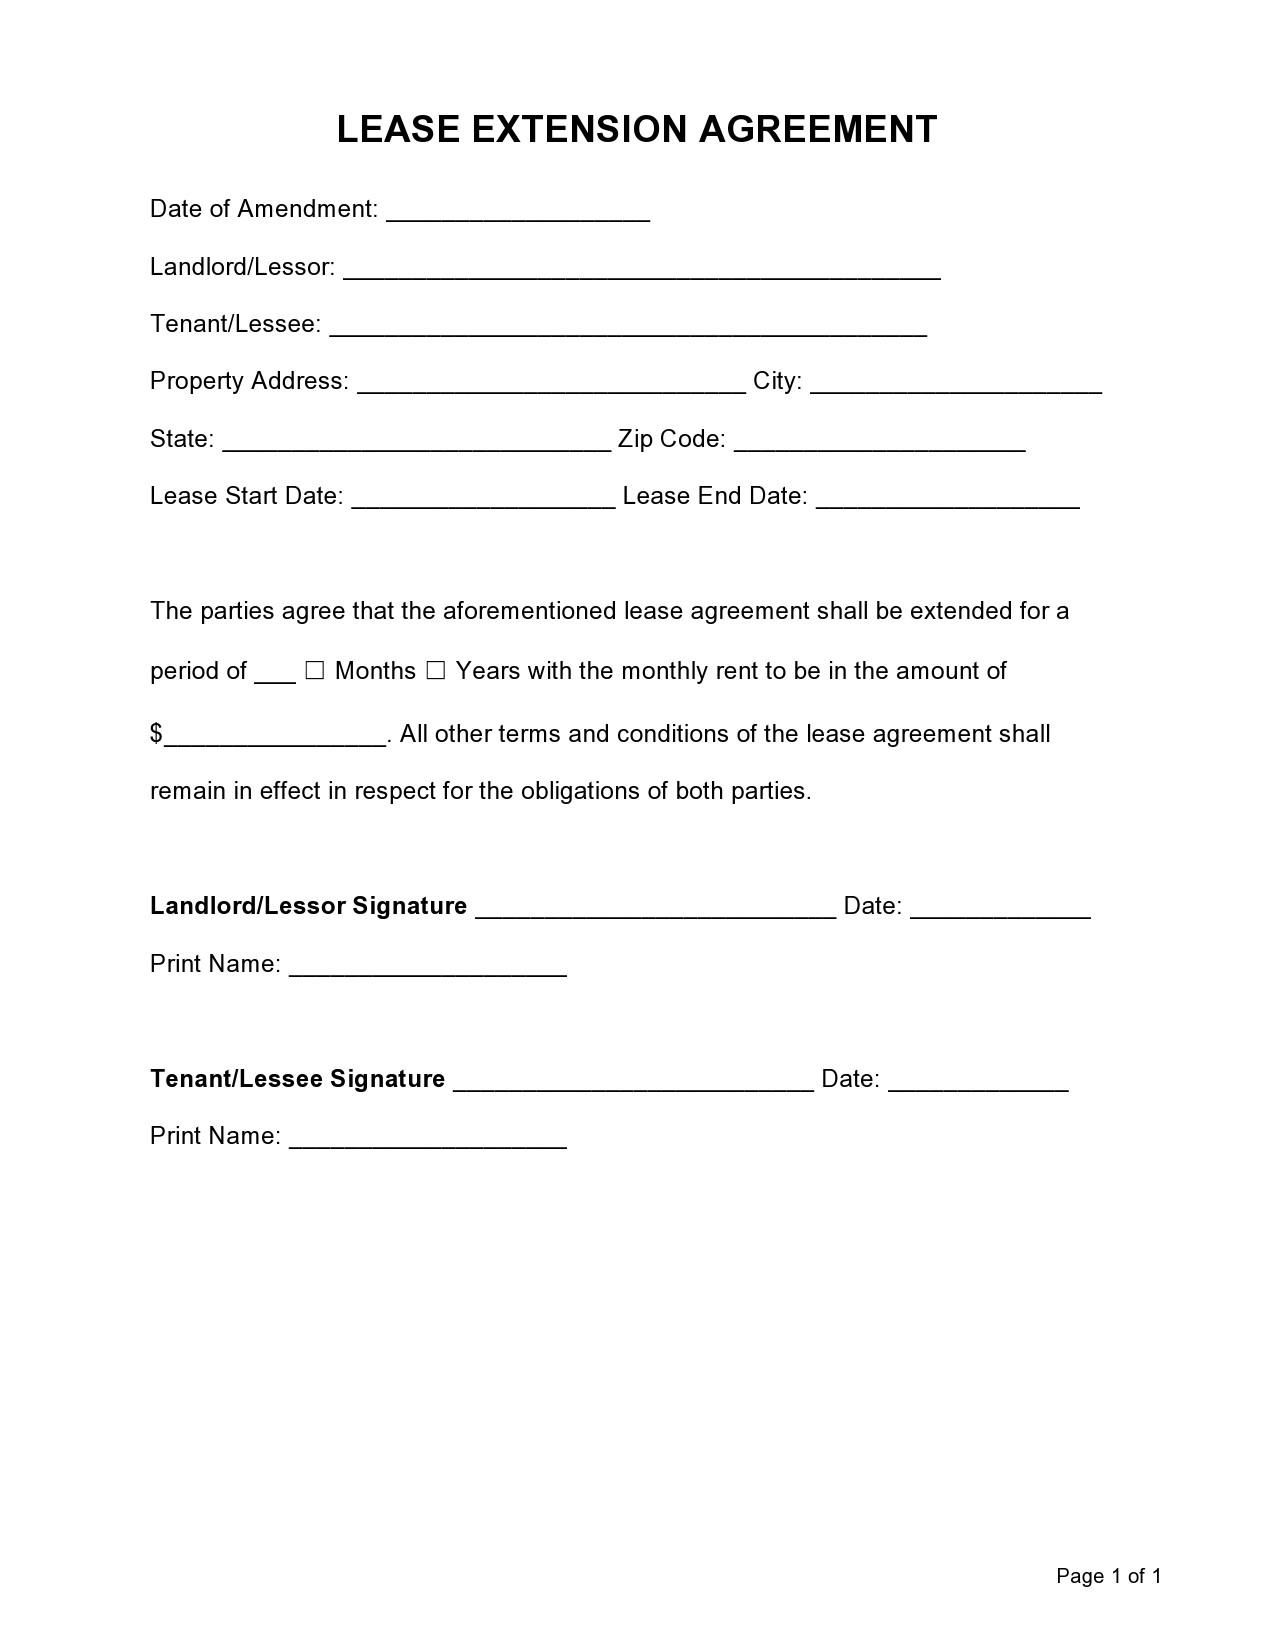 Free lease extension addendum 02